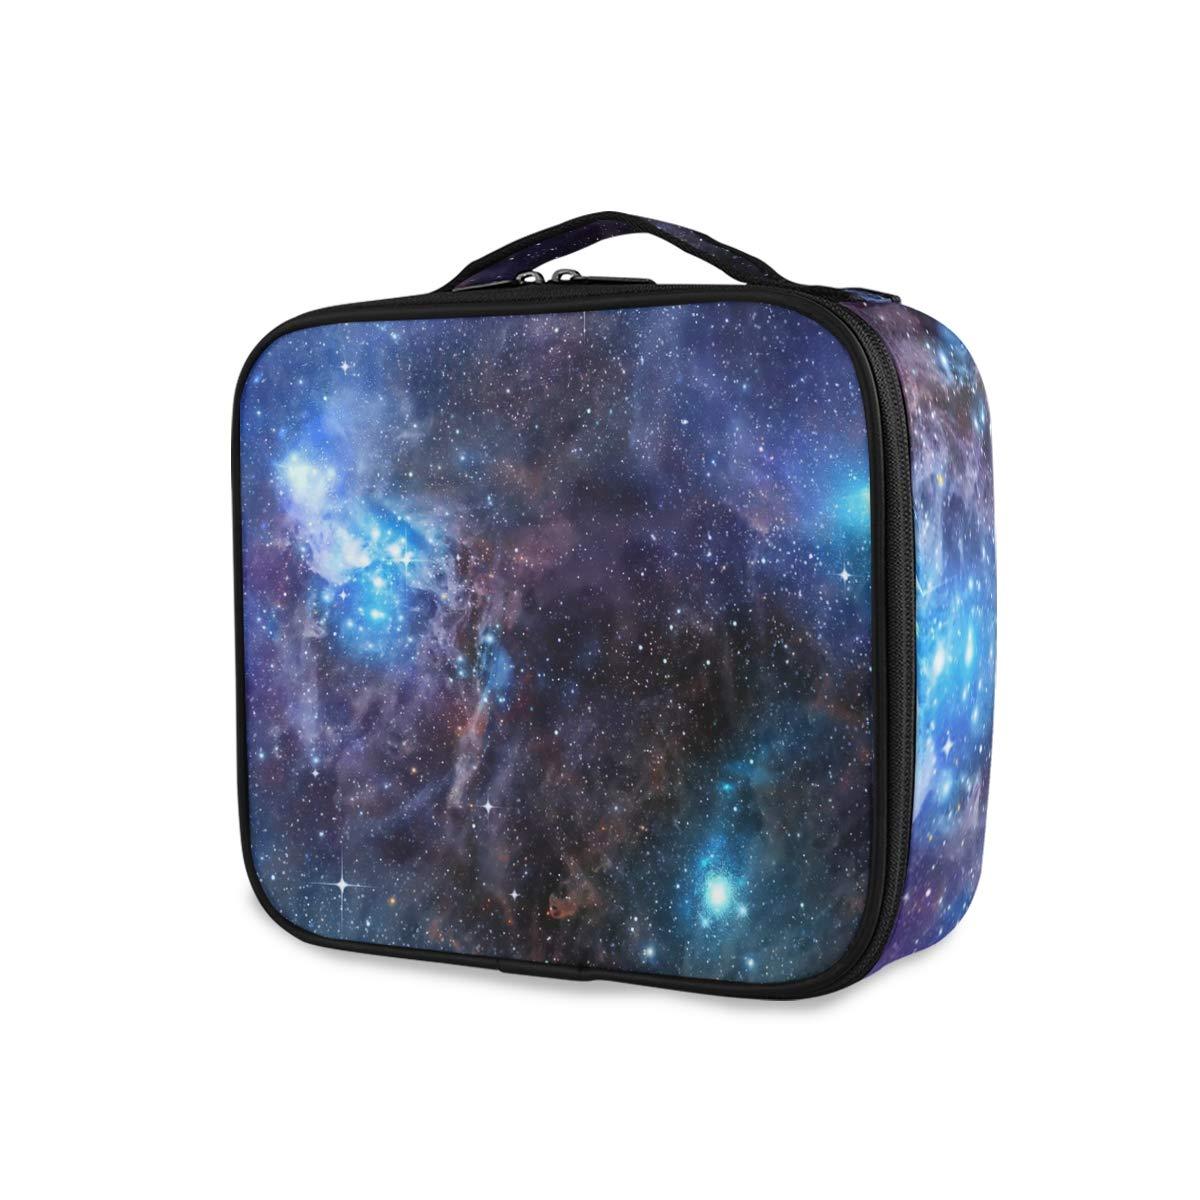 ALAZA Starry Nebula Makeup Organizers Storage Travel Bag Toiletry Bags